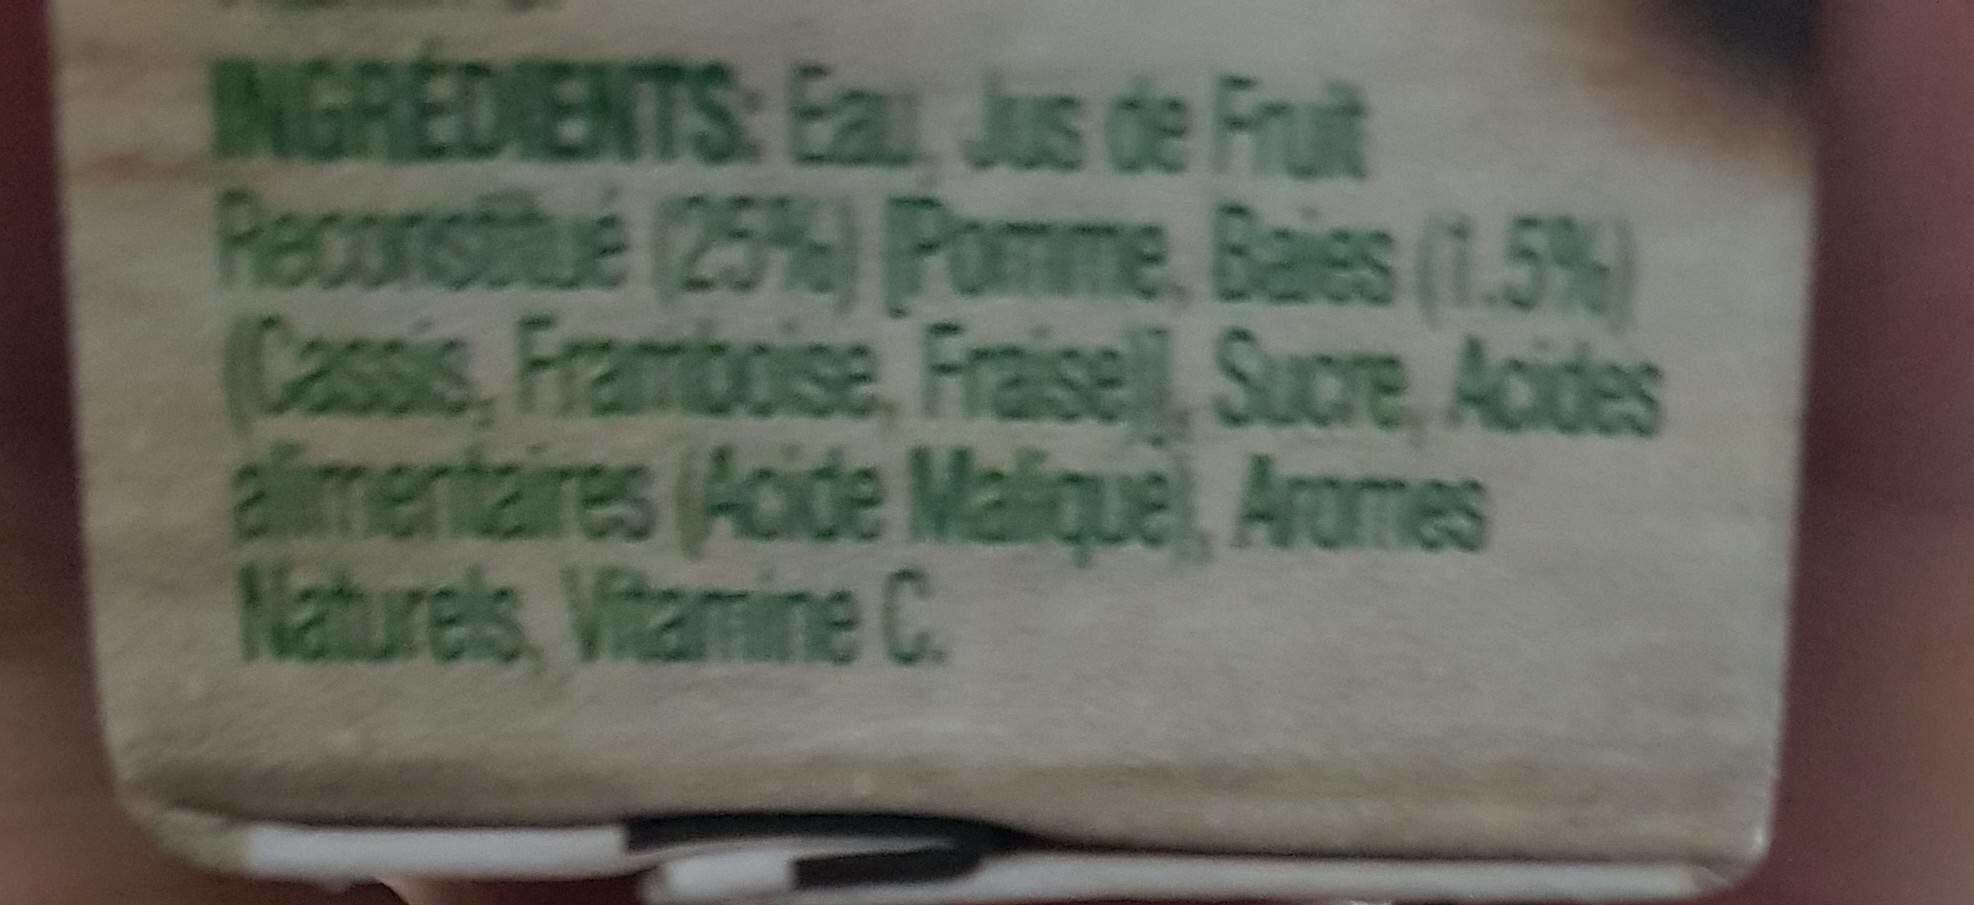 Golden Circle Summer Berries - Ingredients - fr